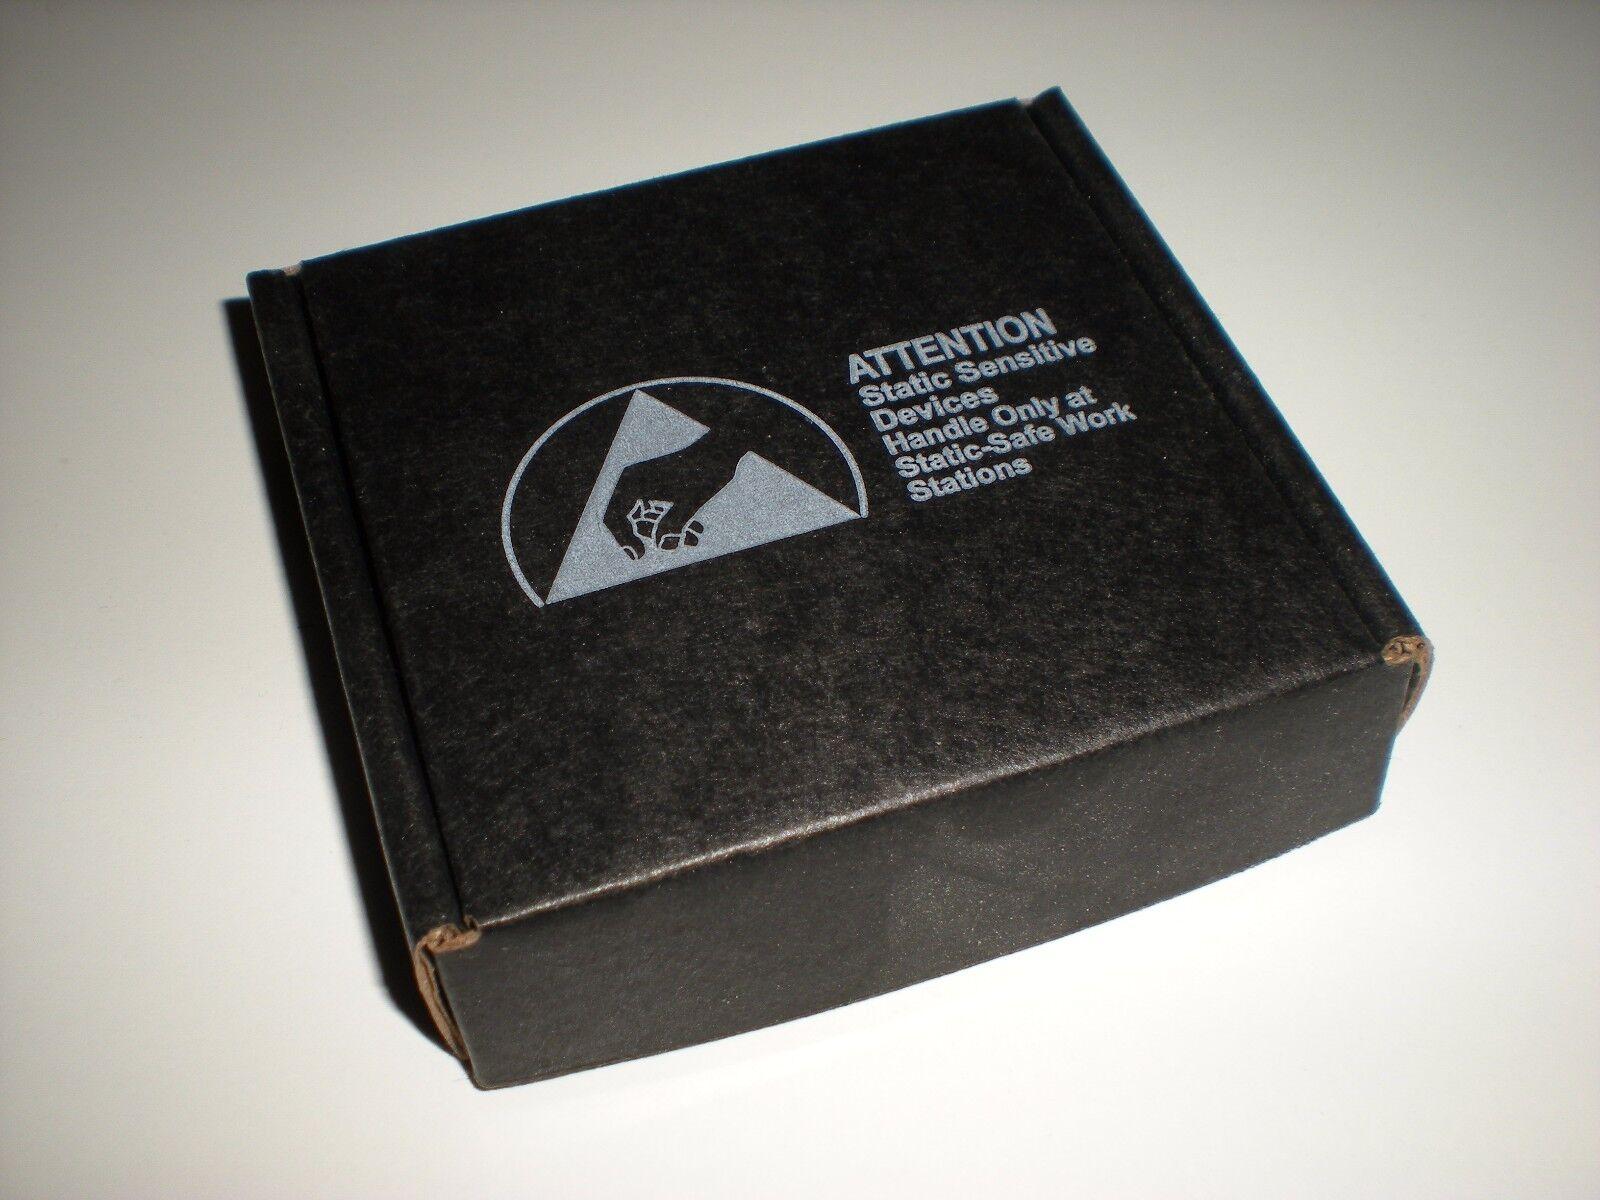 Commodore Amiga CSG 8364R7 Paula 8364 R7 chip in nice condition